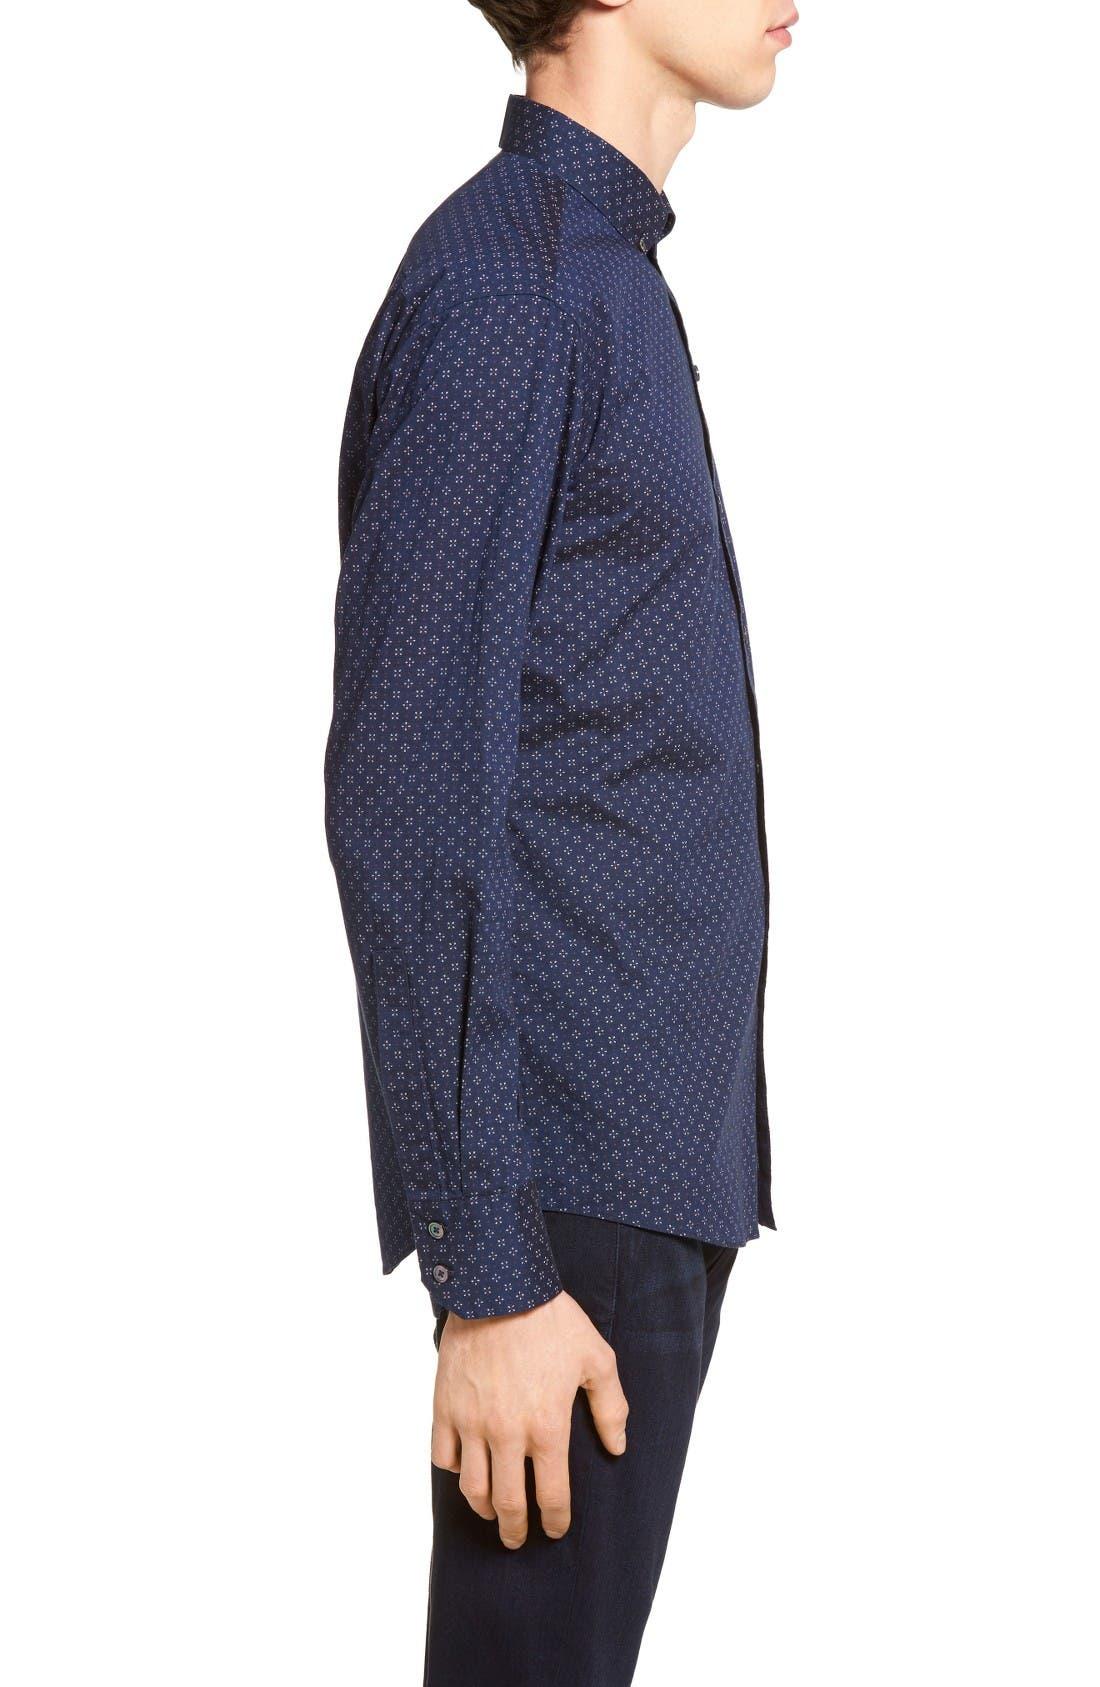 Alternate Image 3  - Zachary Prell Kinnear Slim Fit Print Shirt